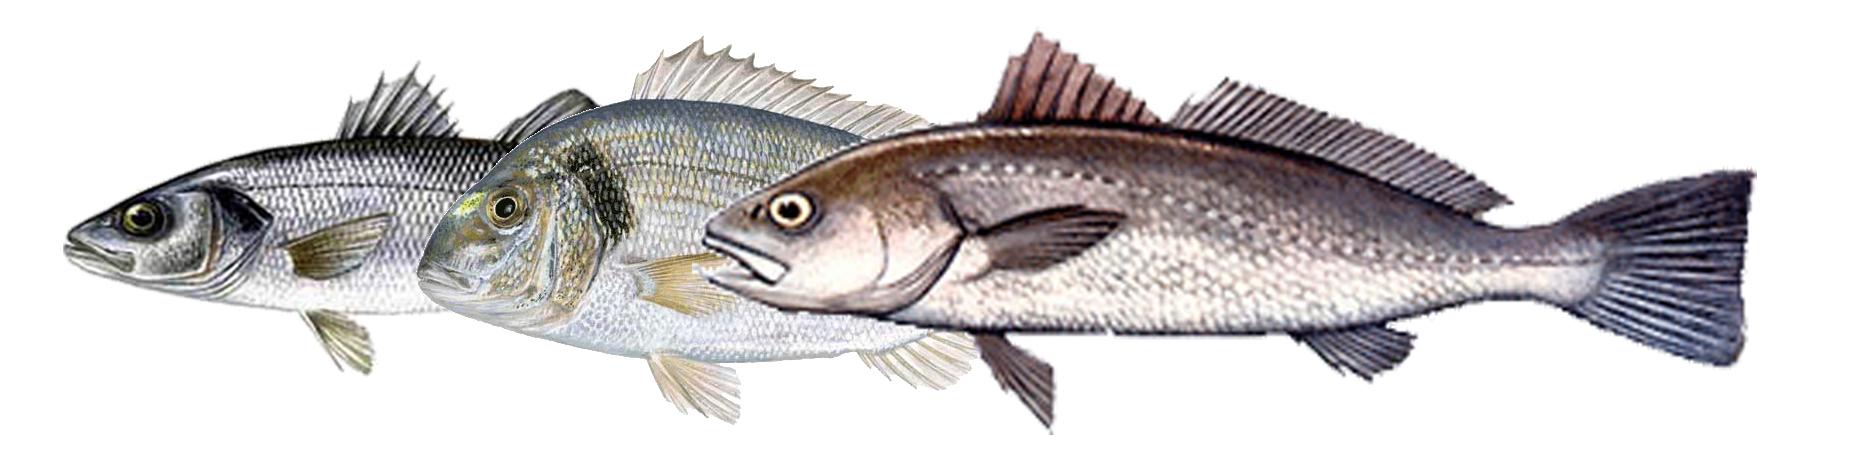 Peces escapados de piscifactoría, ¿Cuánto sabes?. Encuesta.Peixos escapats de piscifactoria, què en saps?. Enquesta.